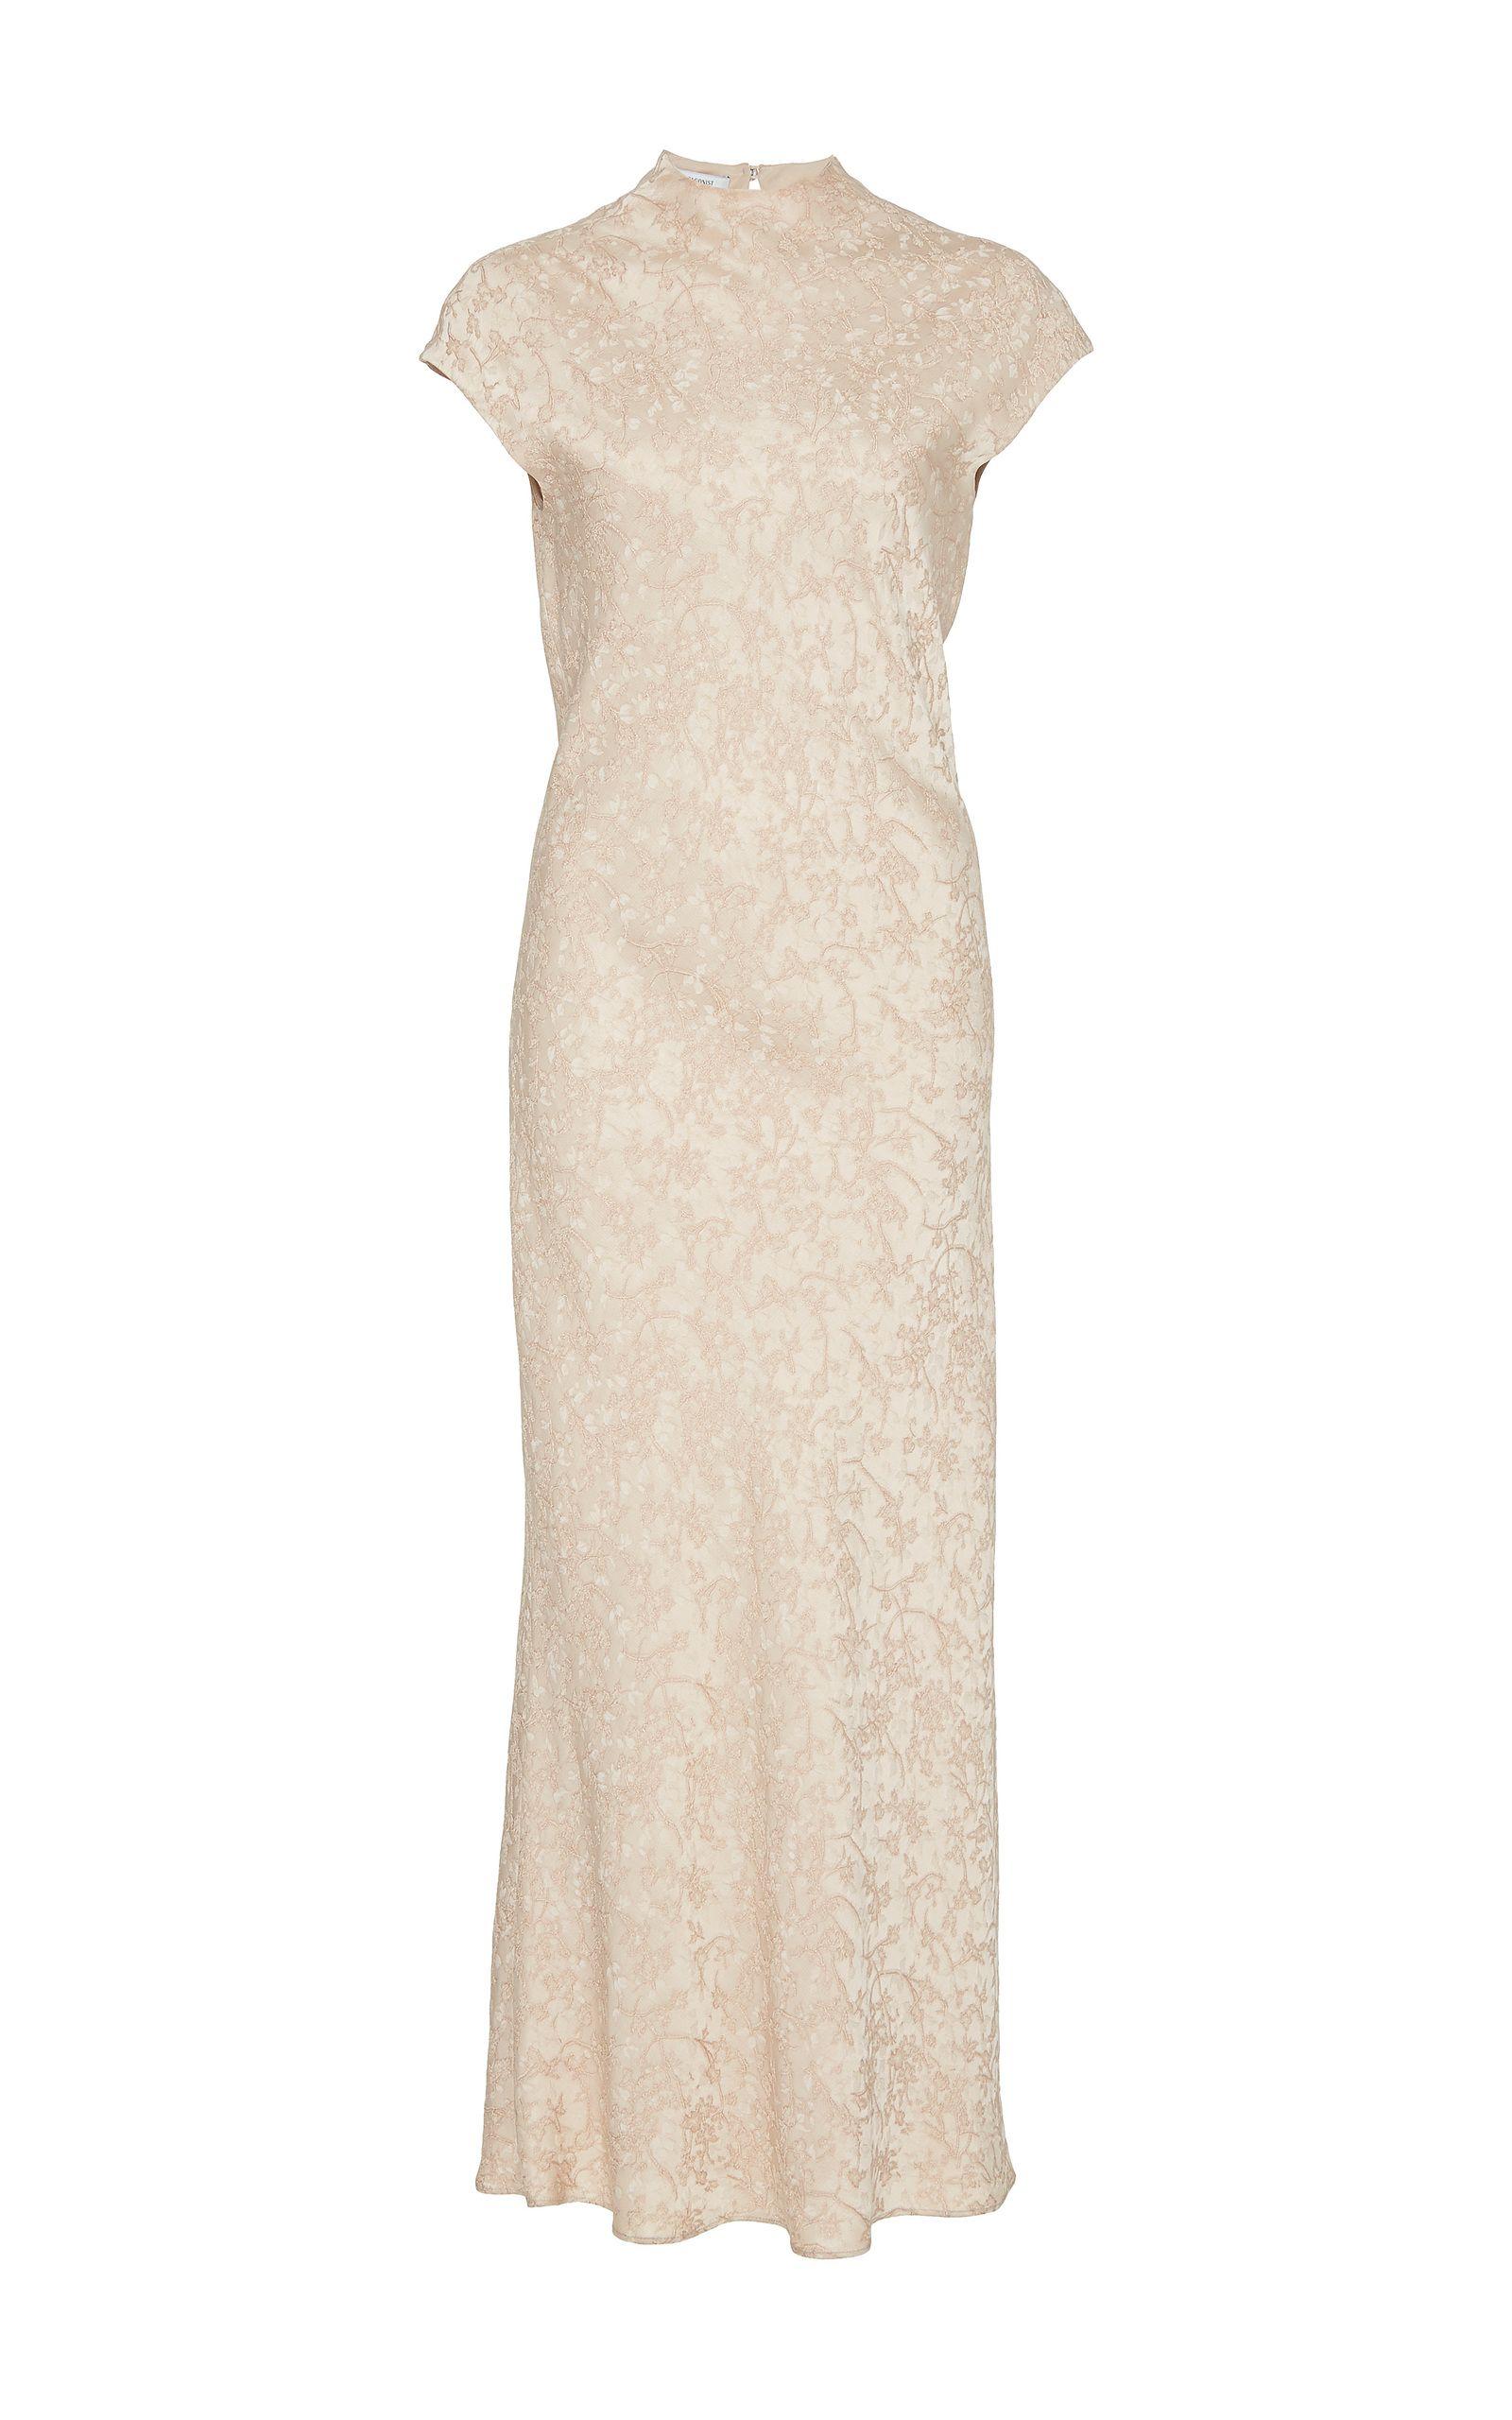 e8417a235fded PROTAGONIST PROTAGONIST CAP SLEEVE BIAS DRESS. #protagonist #cloth ...